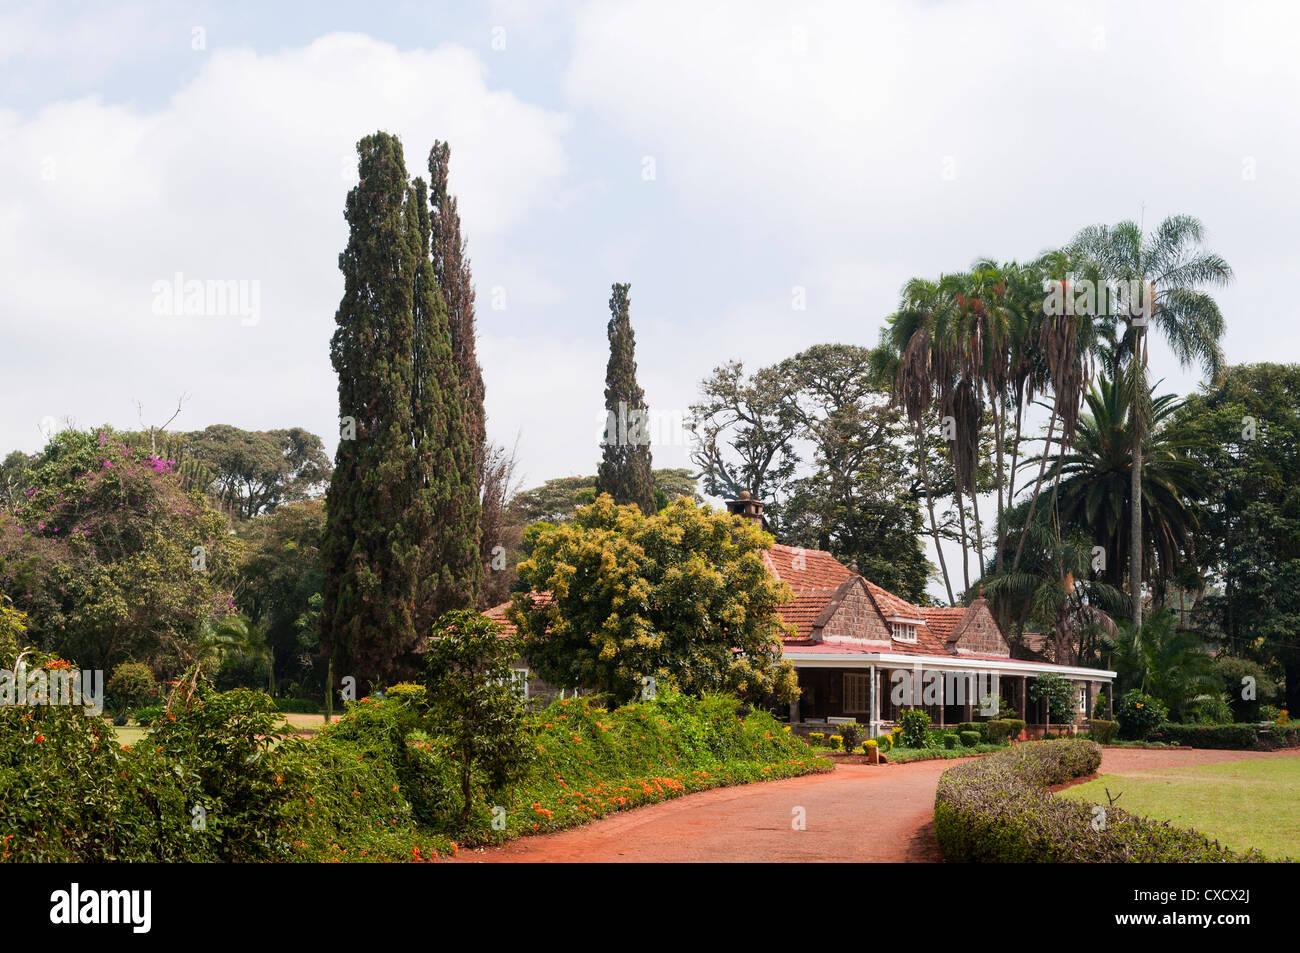 Karen Blixen's house, Nairobi, Kenya, East Africa, Africa - Stock Image